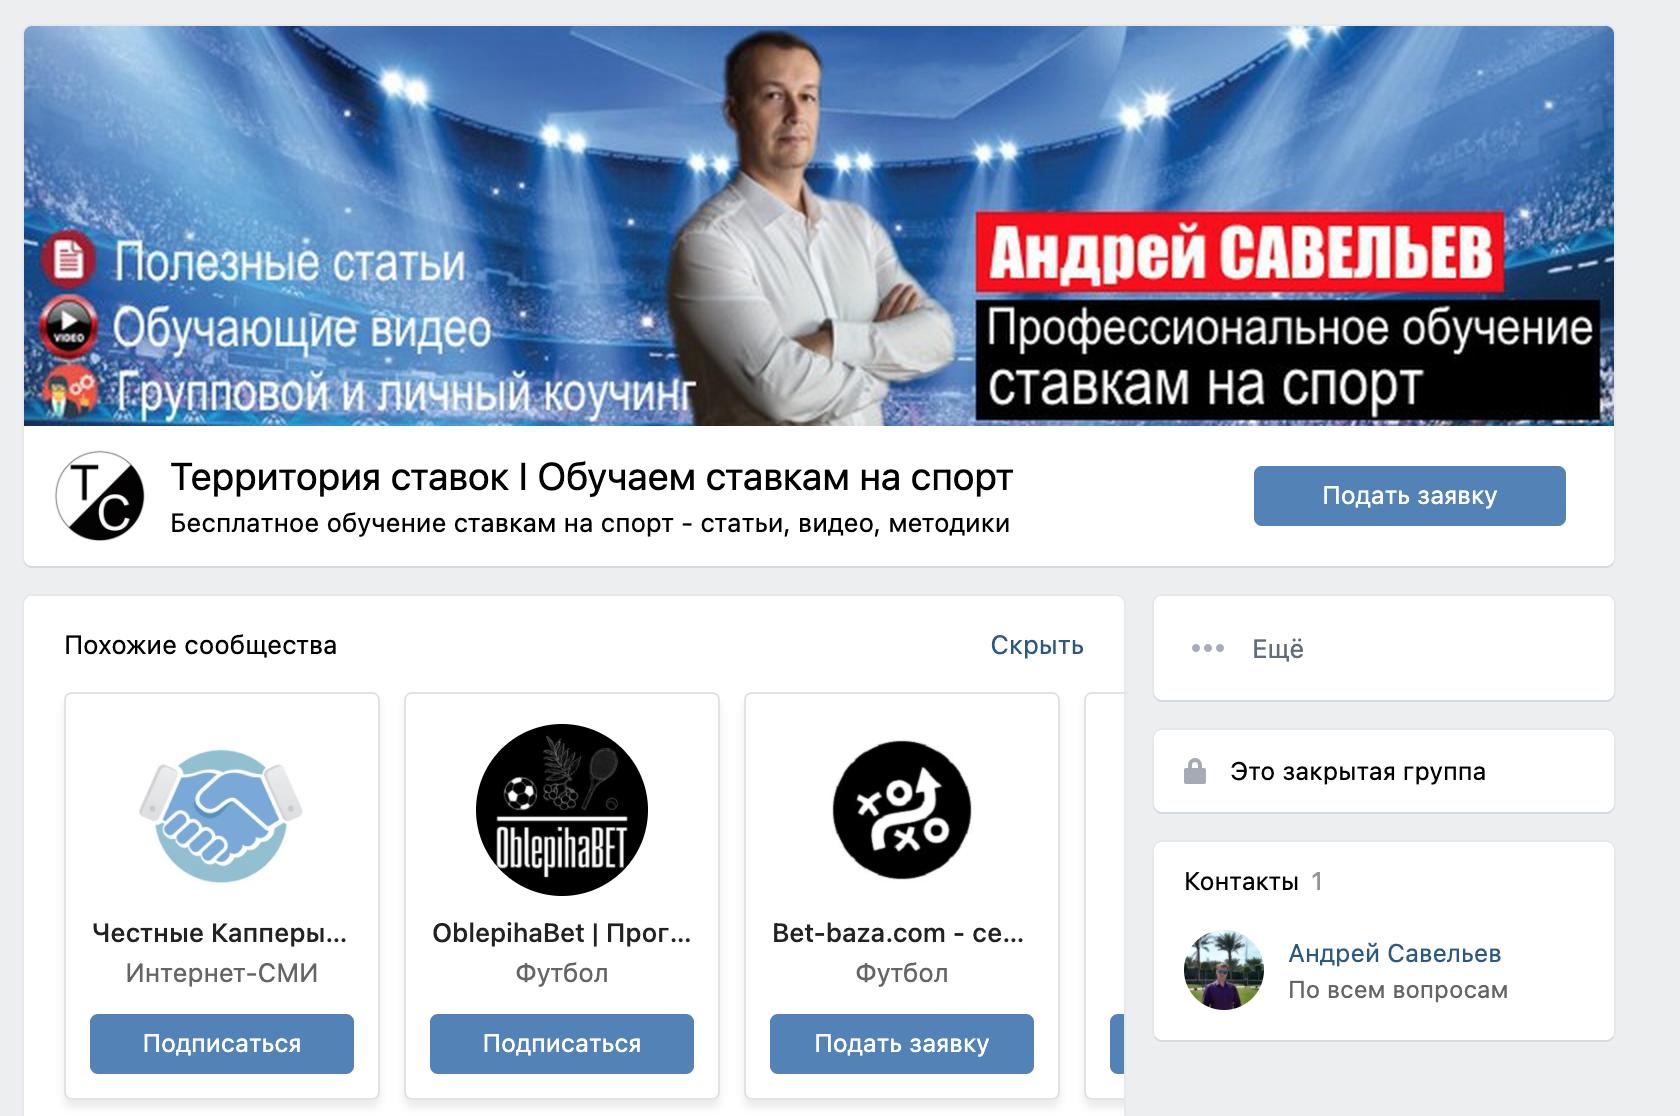 Группа ВК Территория ставок на спорт от Андрея Савельева